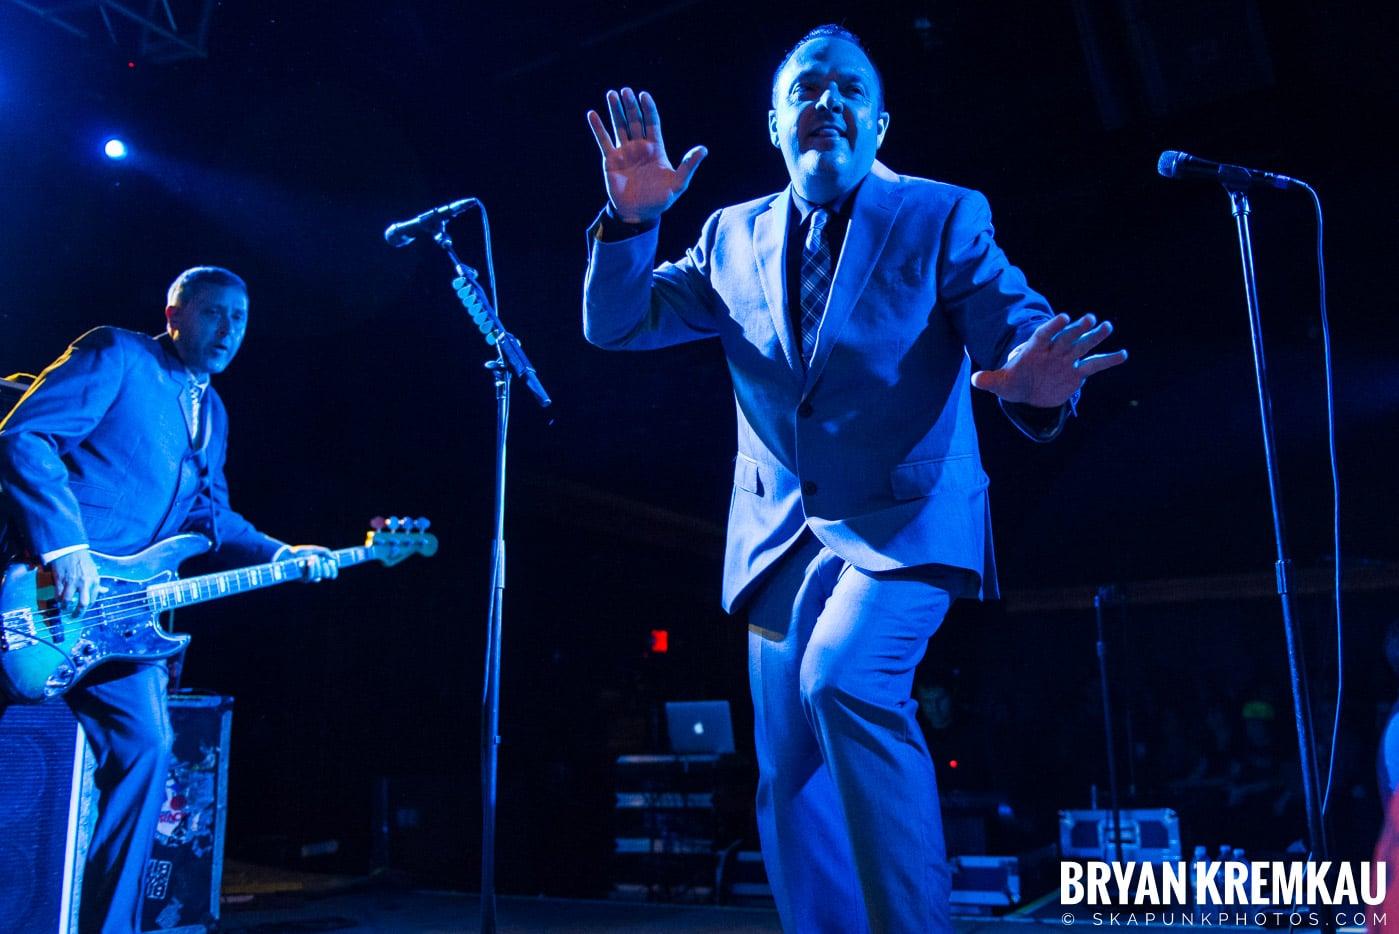 Mighty Mighty Bosstones @ Starland Ballroom, Sayreville, NJ - 7.29.17 (35)